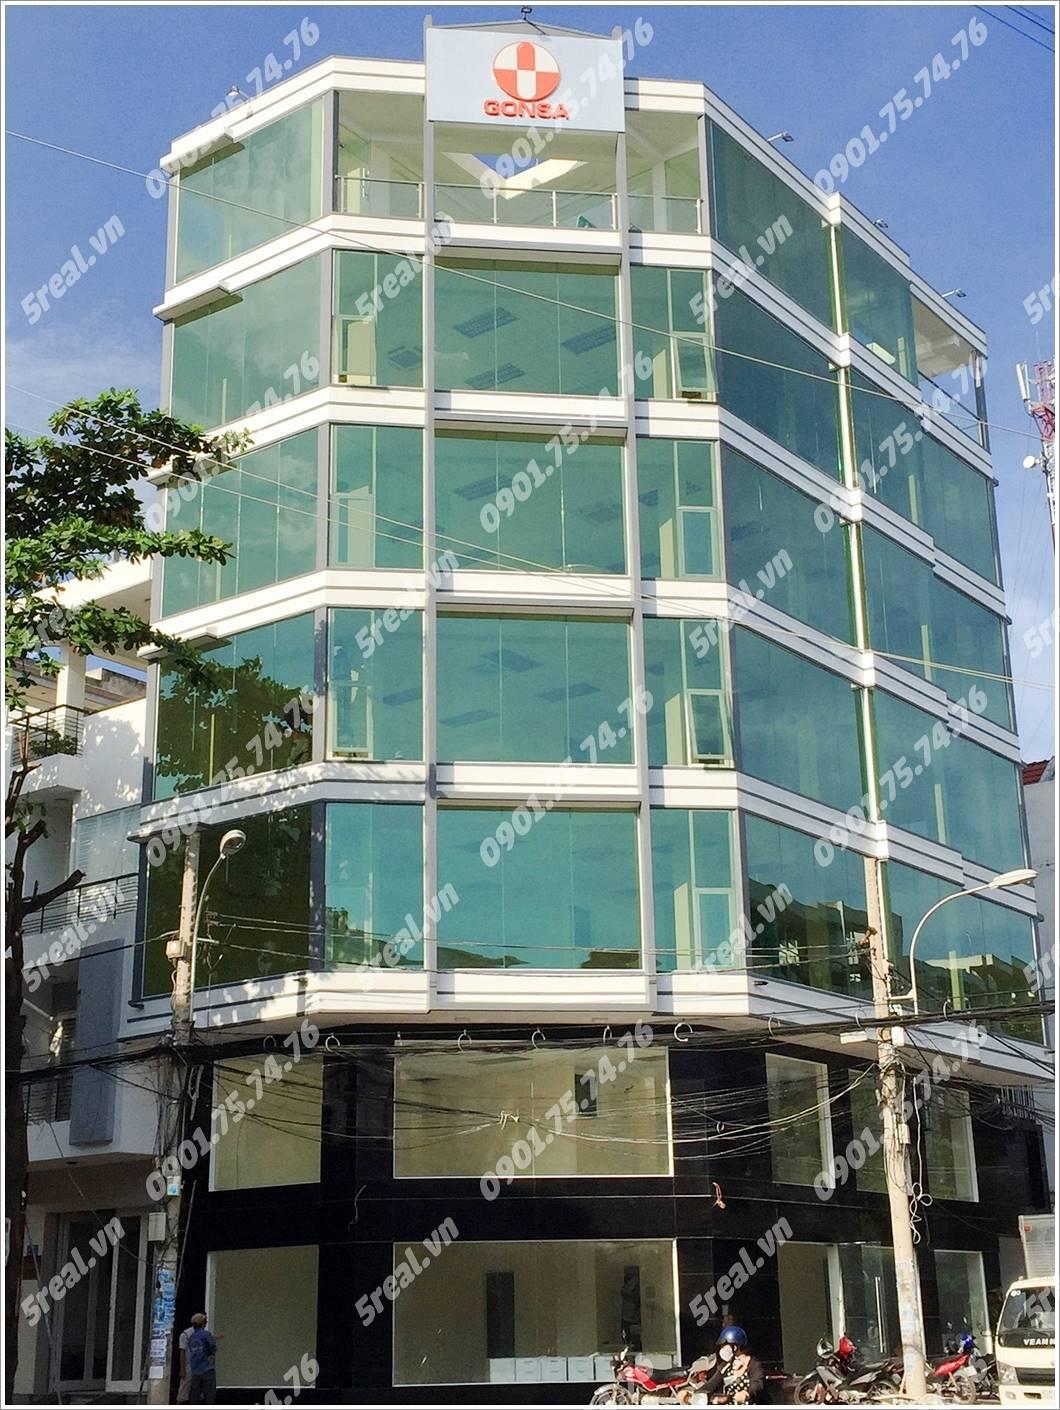 gonsa-building-vo-liem-son-quan-8-van-phong-cho-thue-5real.vn-01